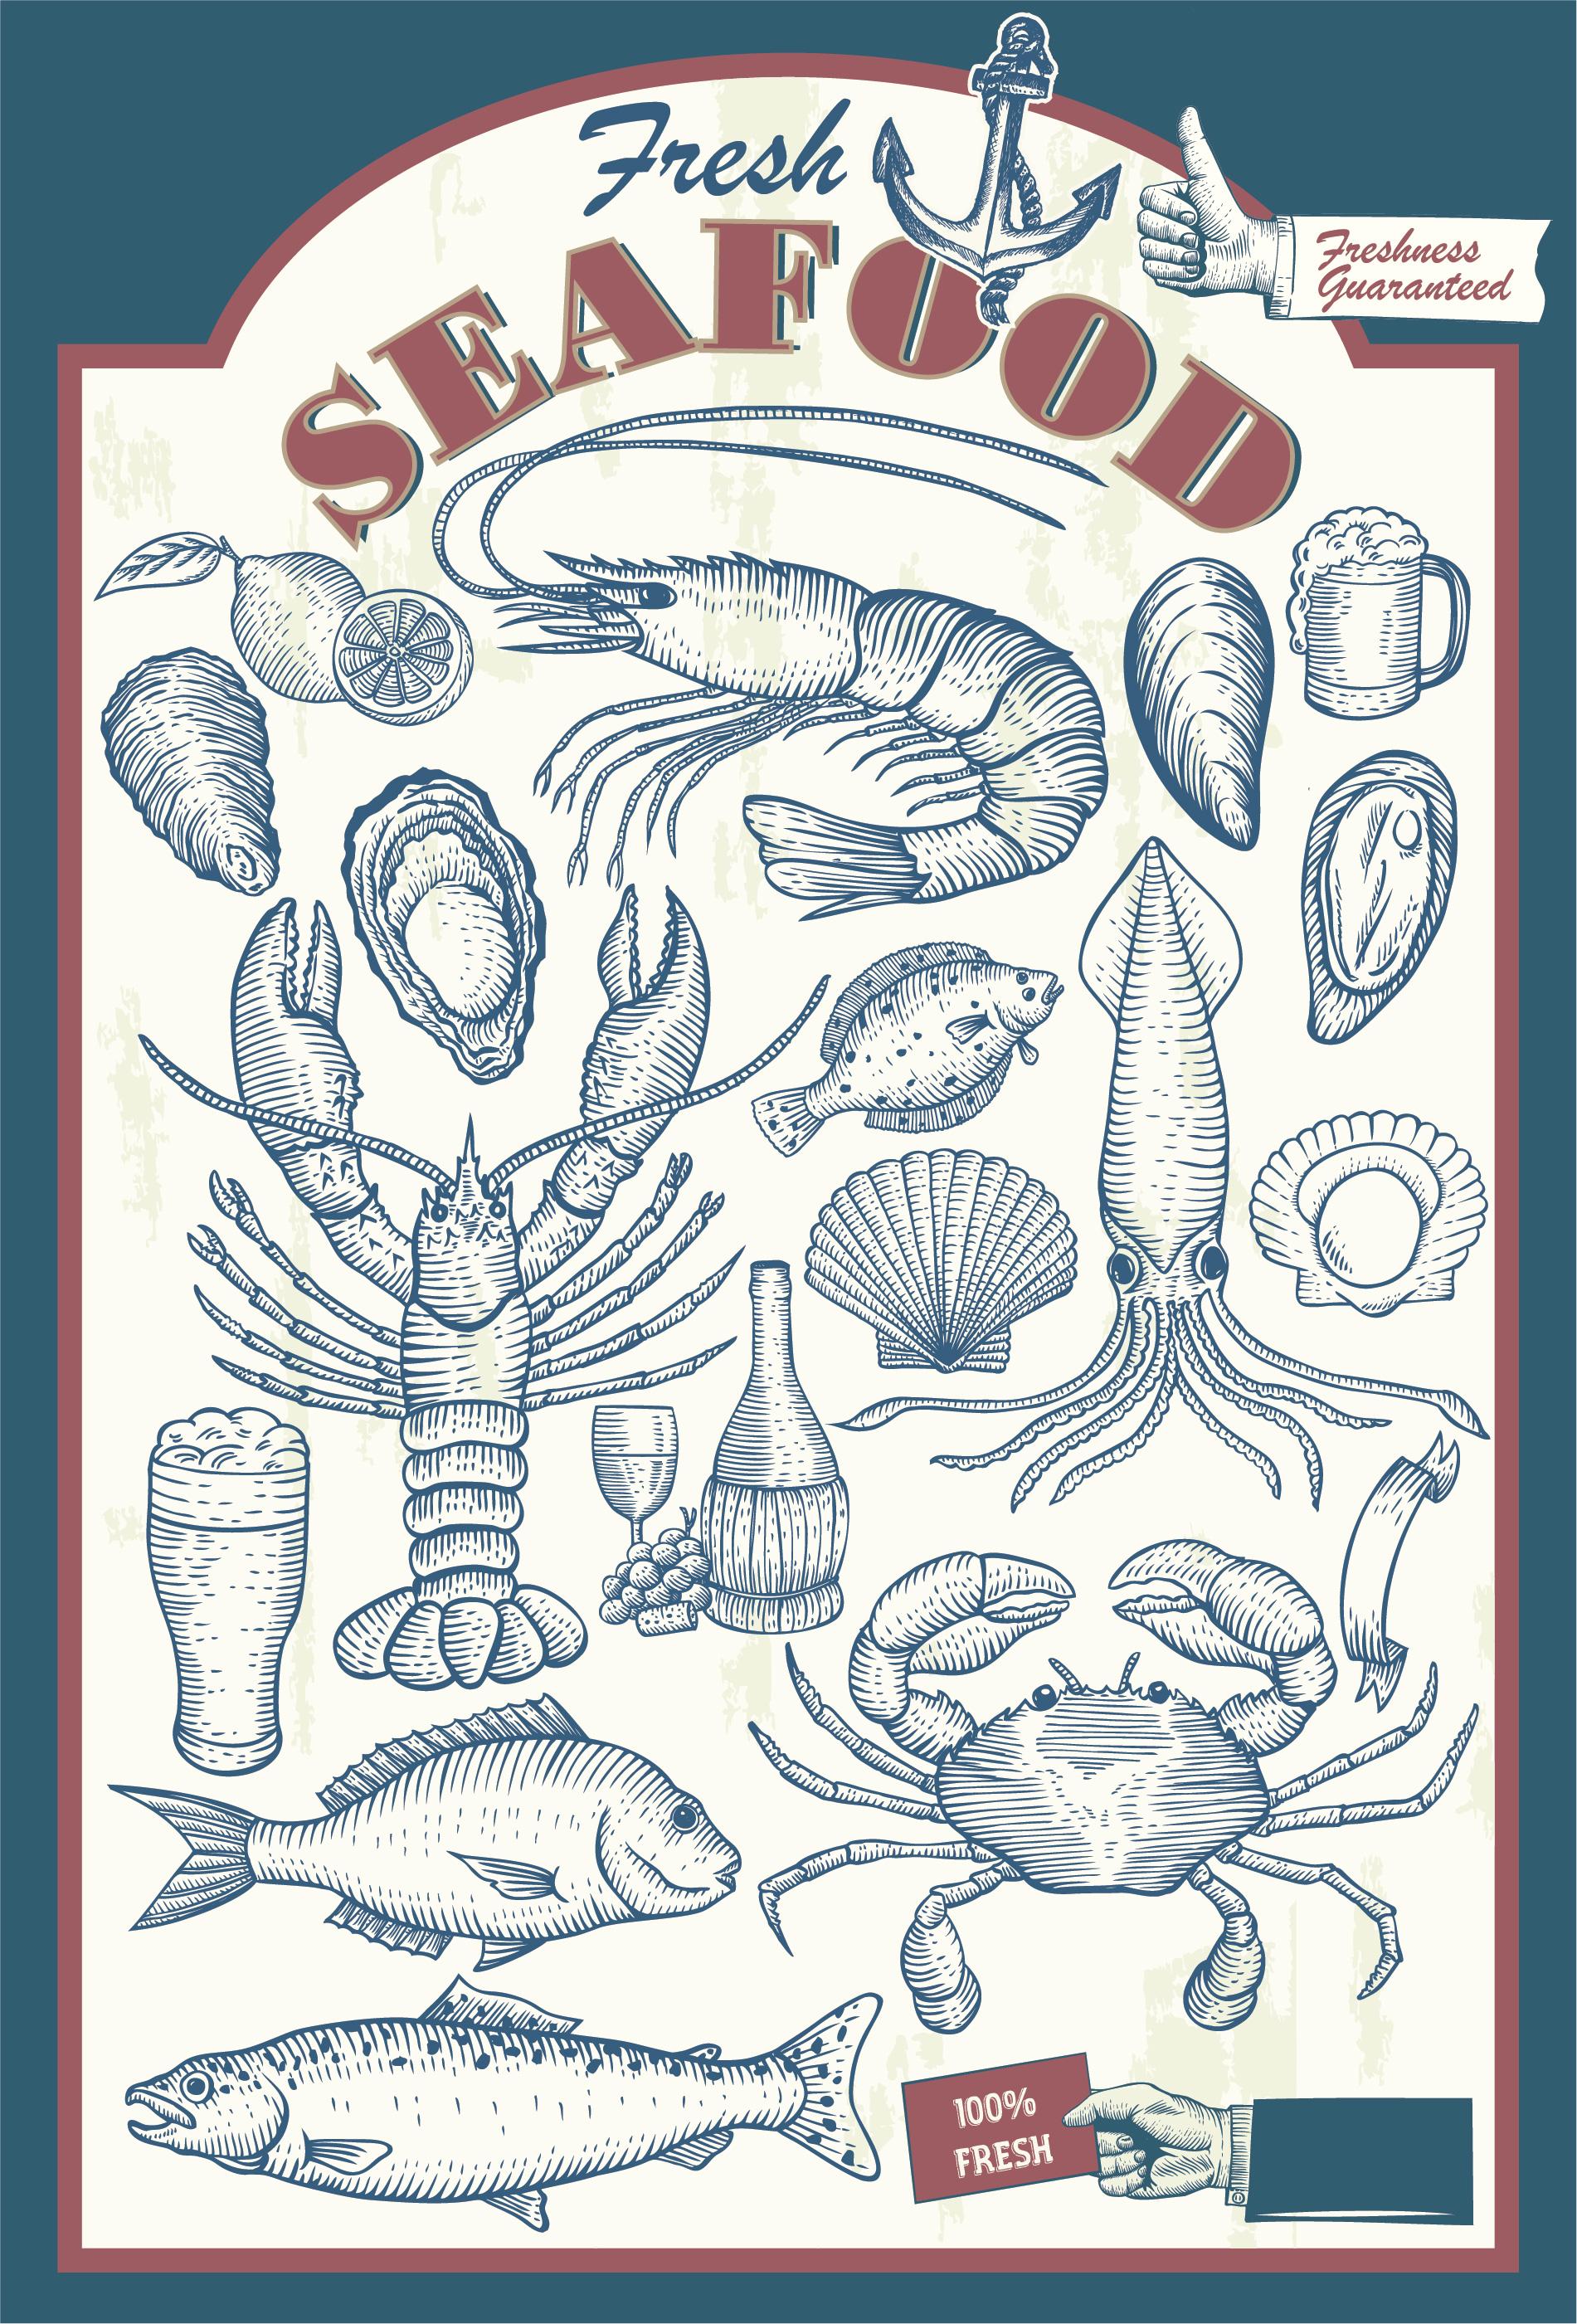 Stuart Seafood Festival